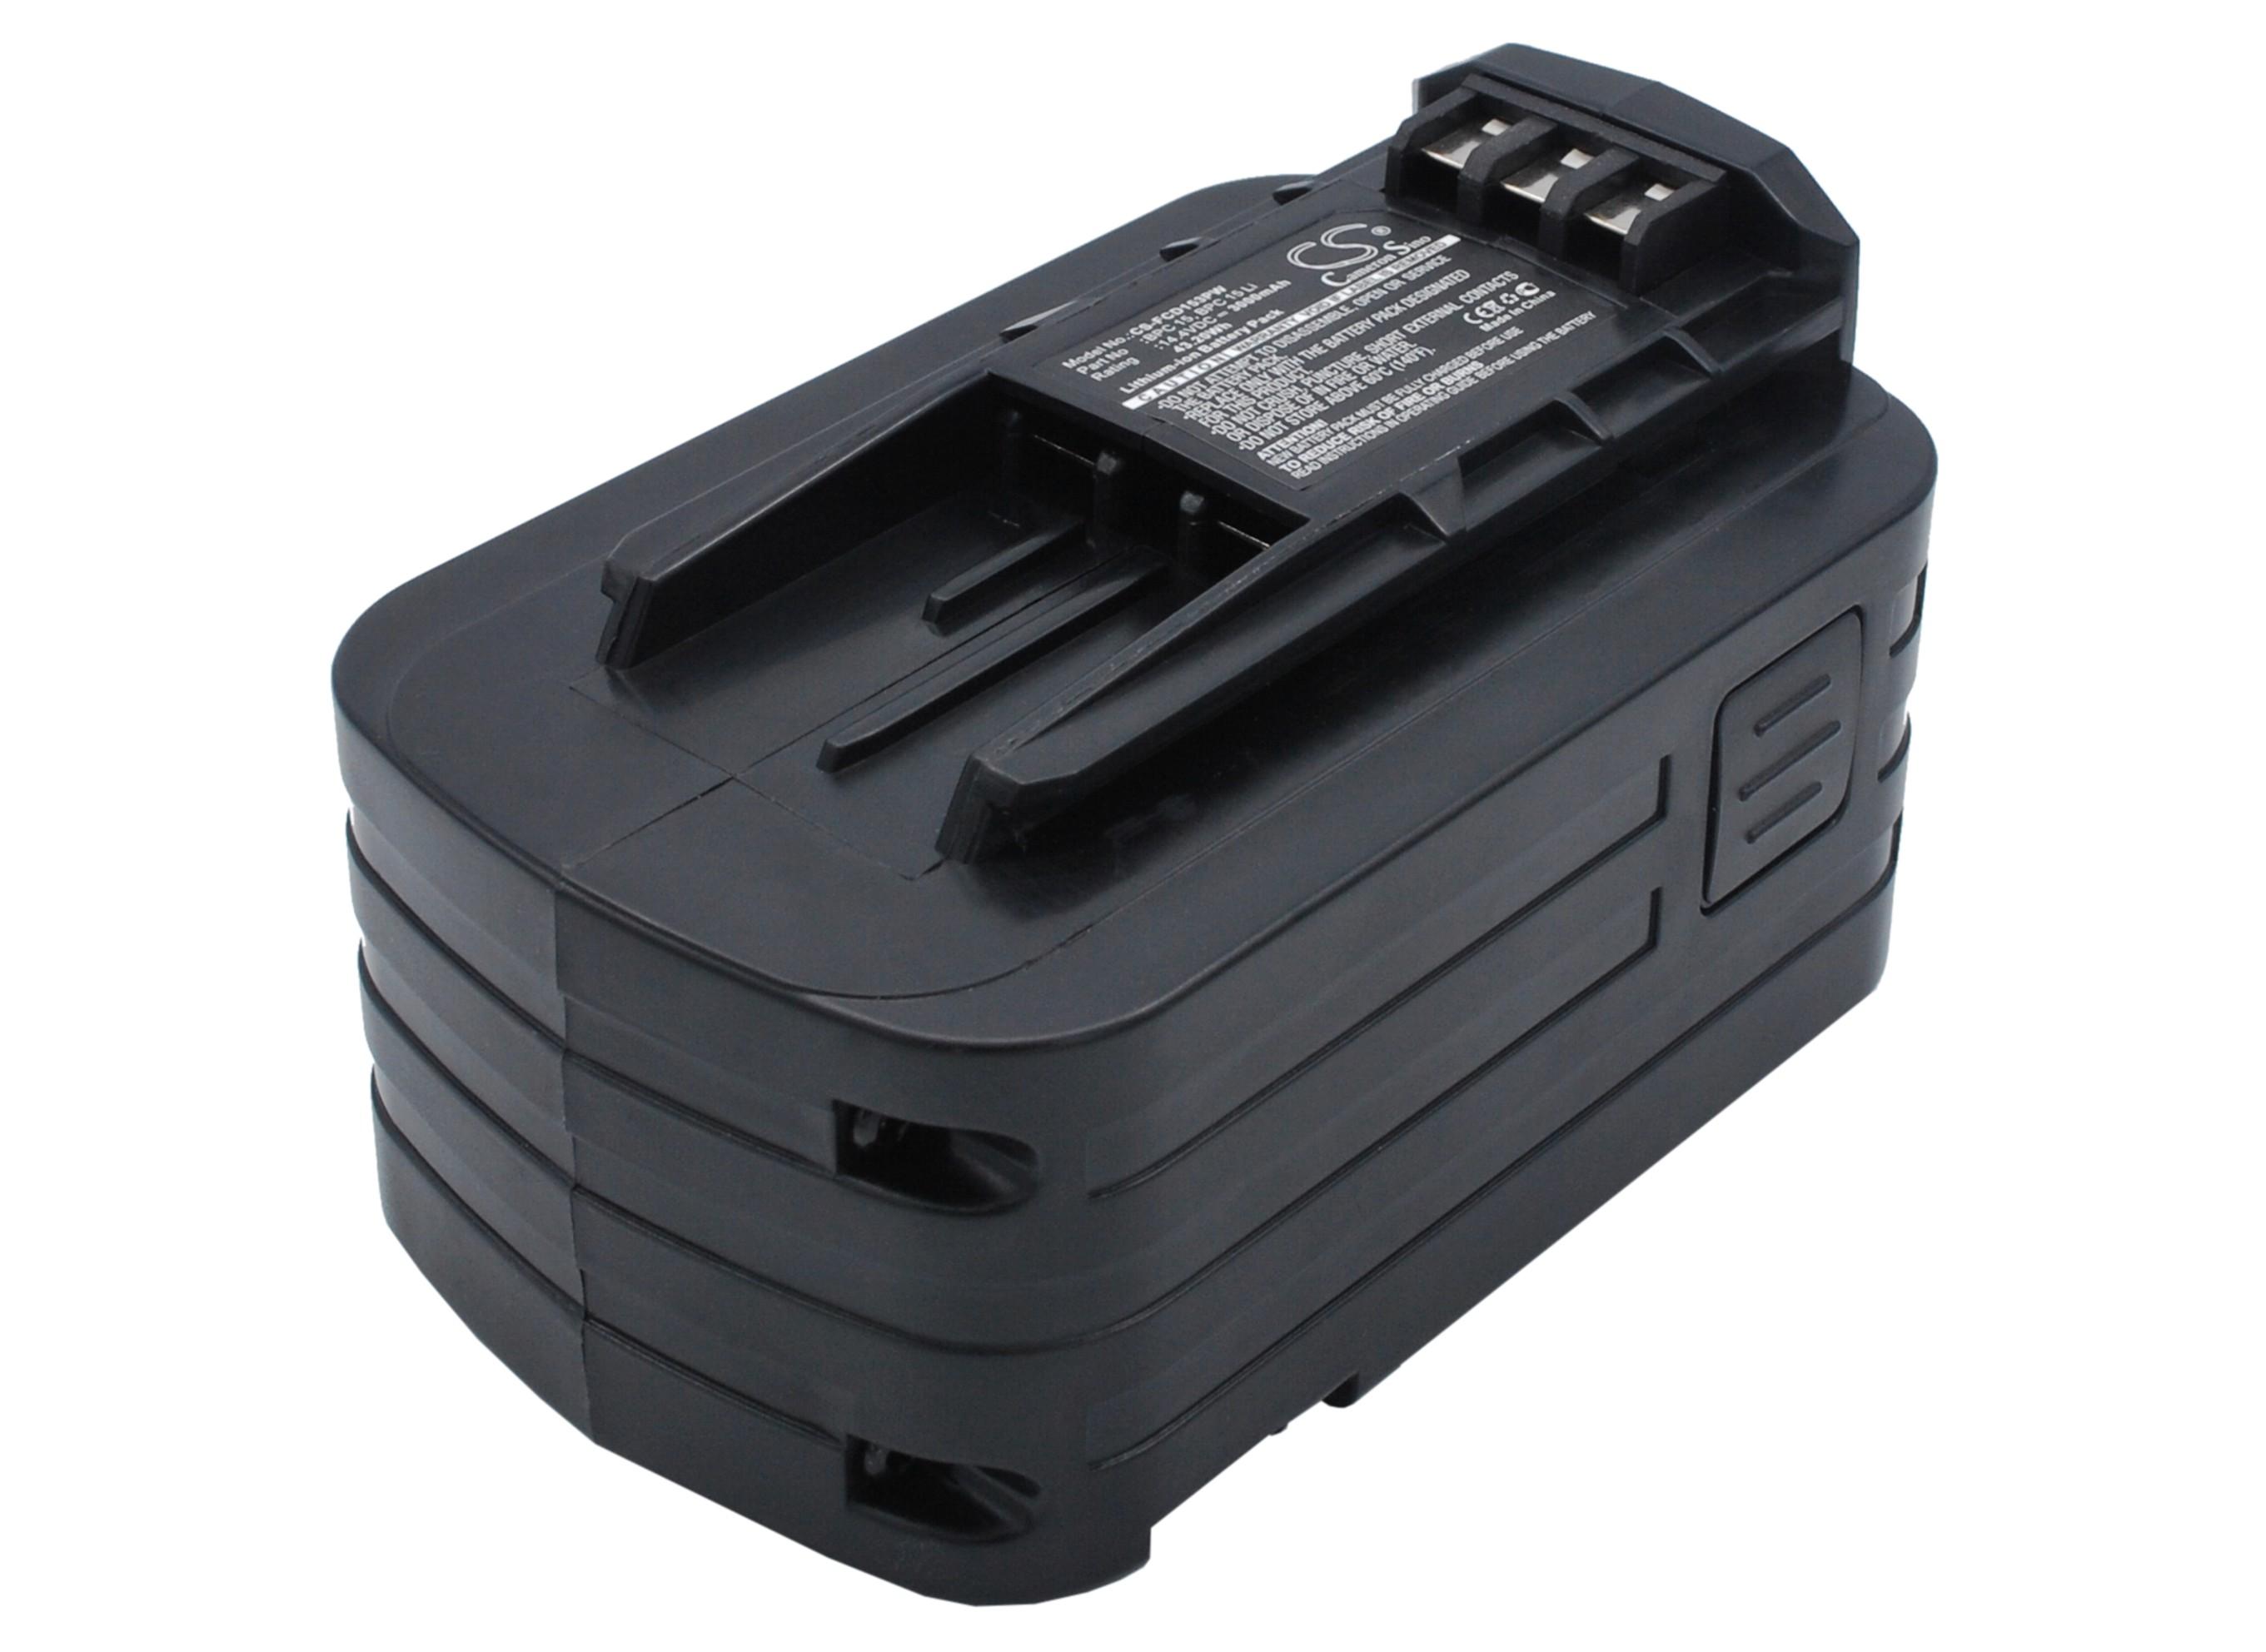 Cameron Sino baterie do nářadí pro FESTOOL DRC18 Cordless Drill/Driver 14.4V Li-ion 3000mAh černá - neoriginální